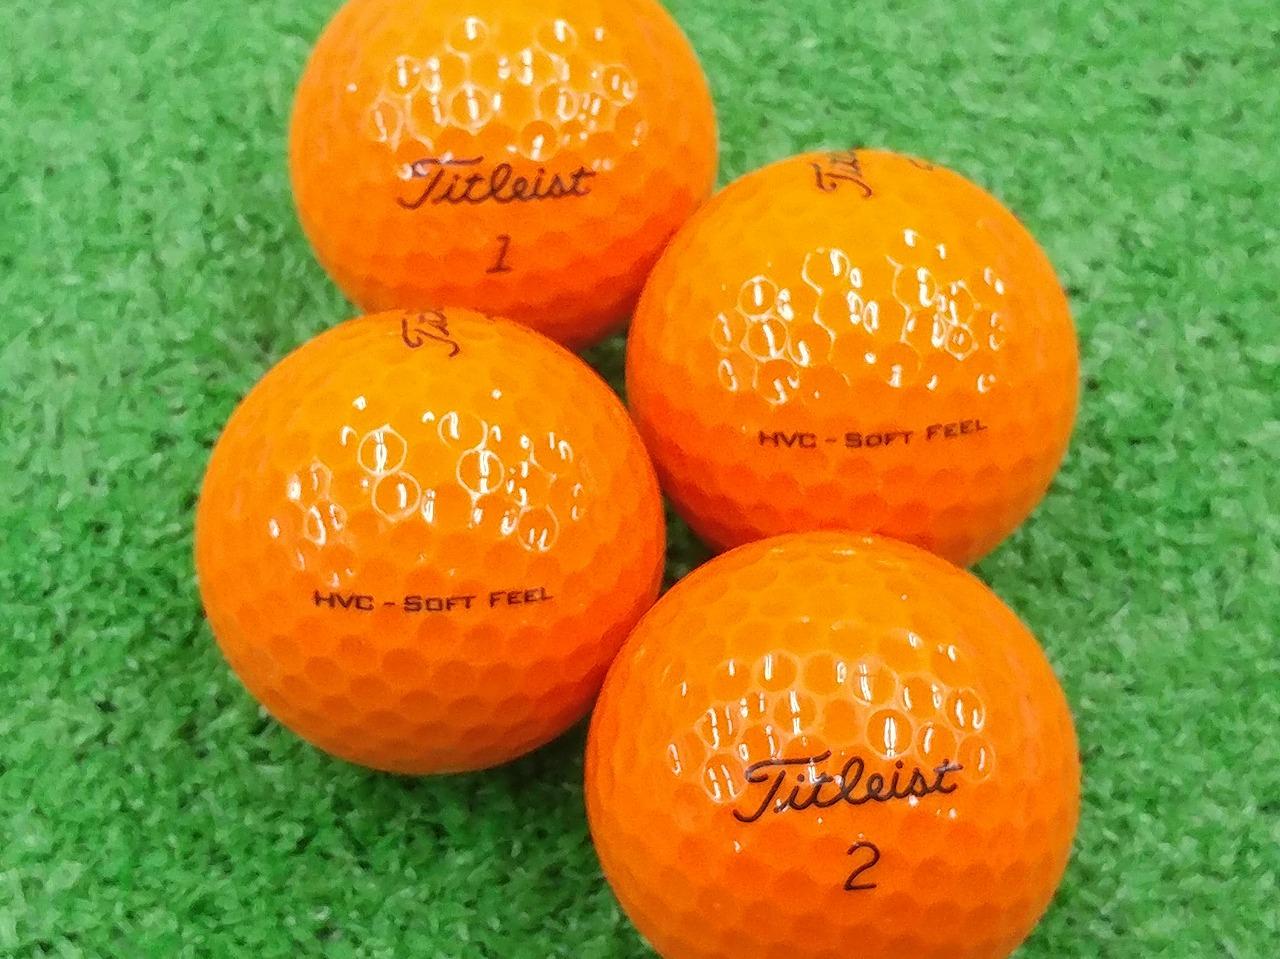 【Aランク】Titleist(タイトリスト) HVC SOFT FEEL オレンジ 2017年モデル 1個